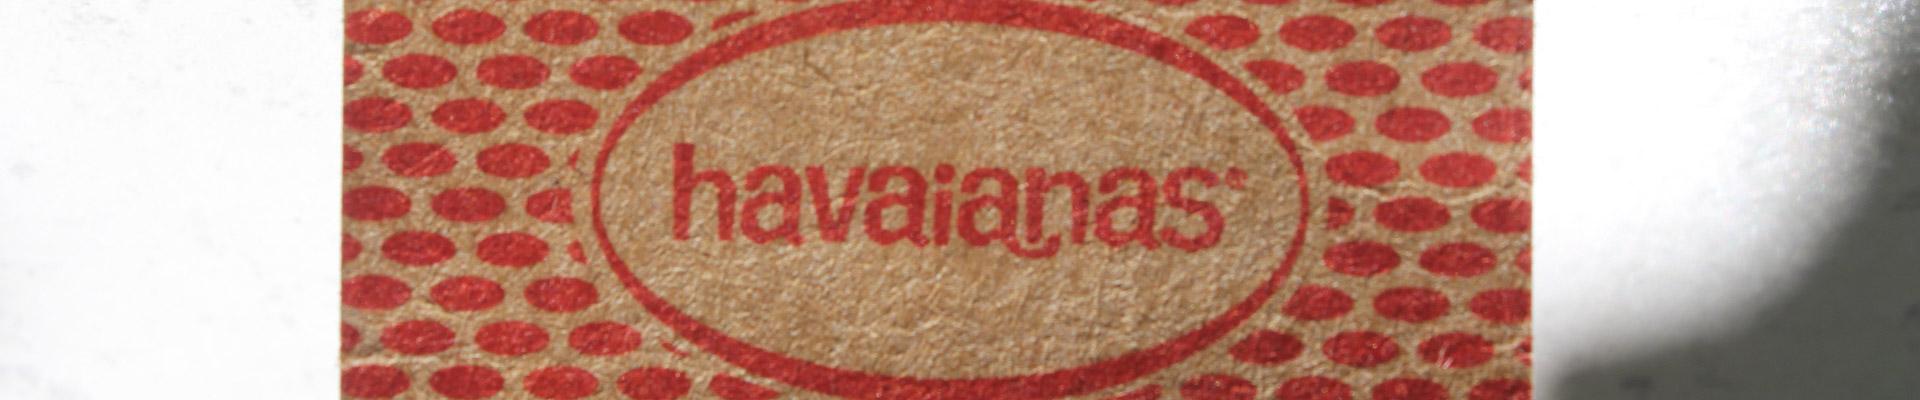 havaianas logo tongs homme